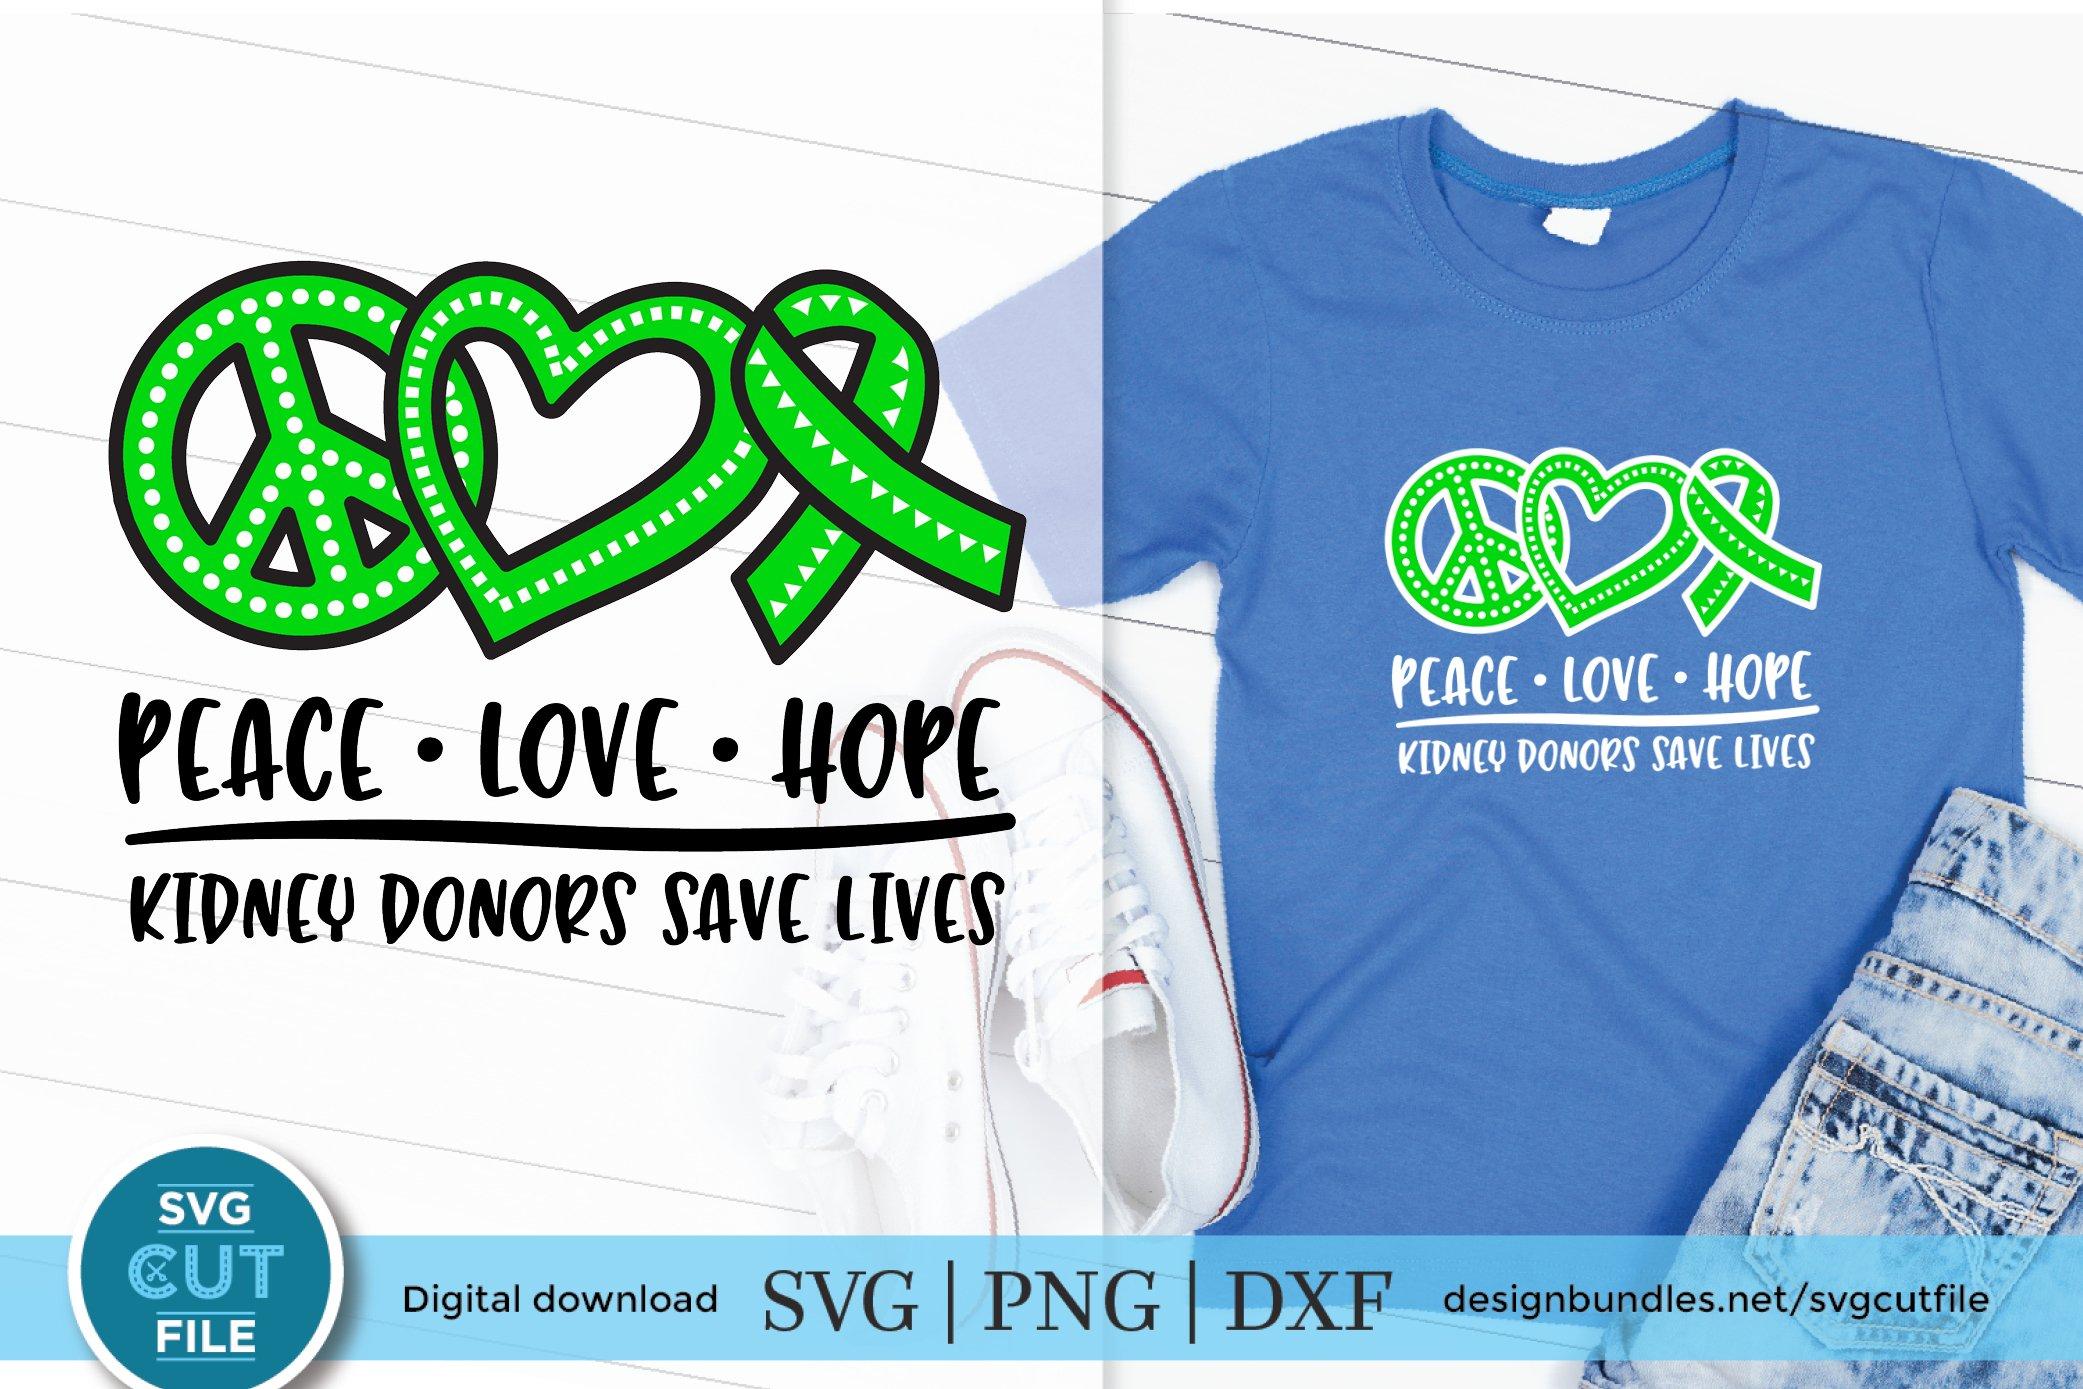 Download Kidney Donor Svg A Peace Love Hope Kidney Donation Svg 923635 Cut Files Design Bundles